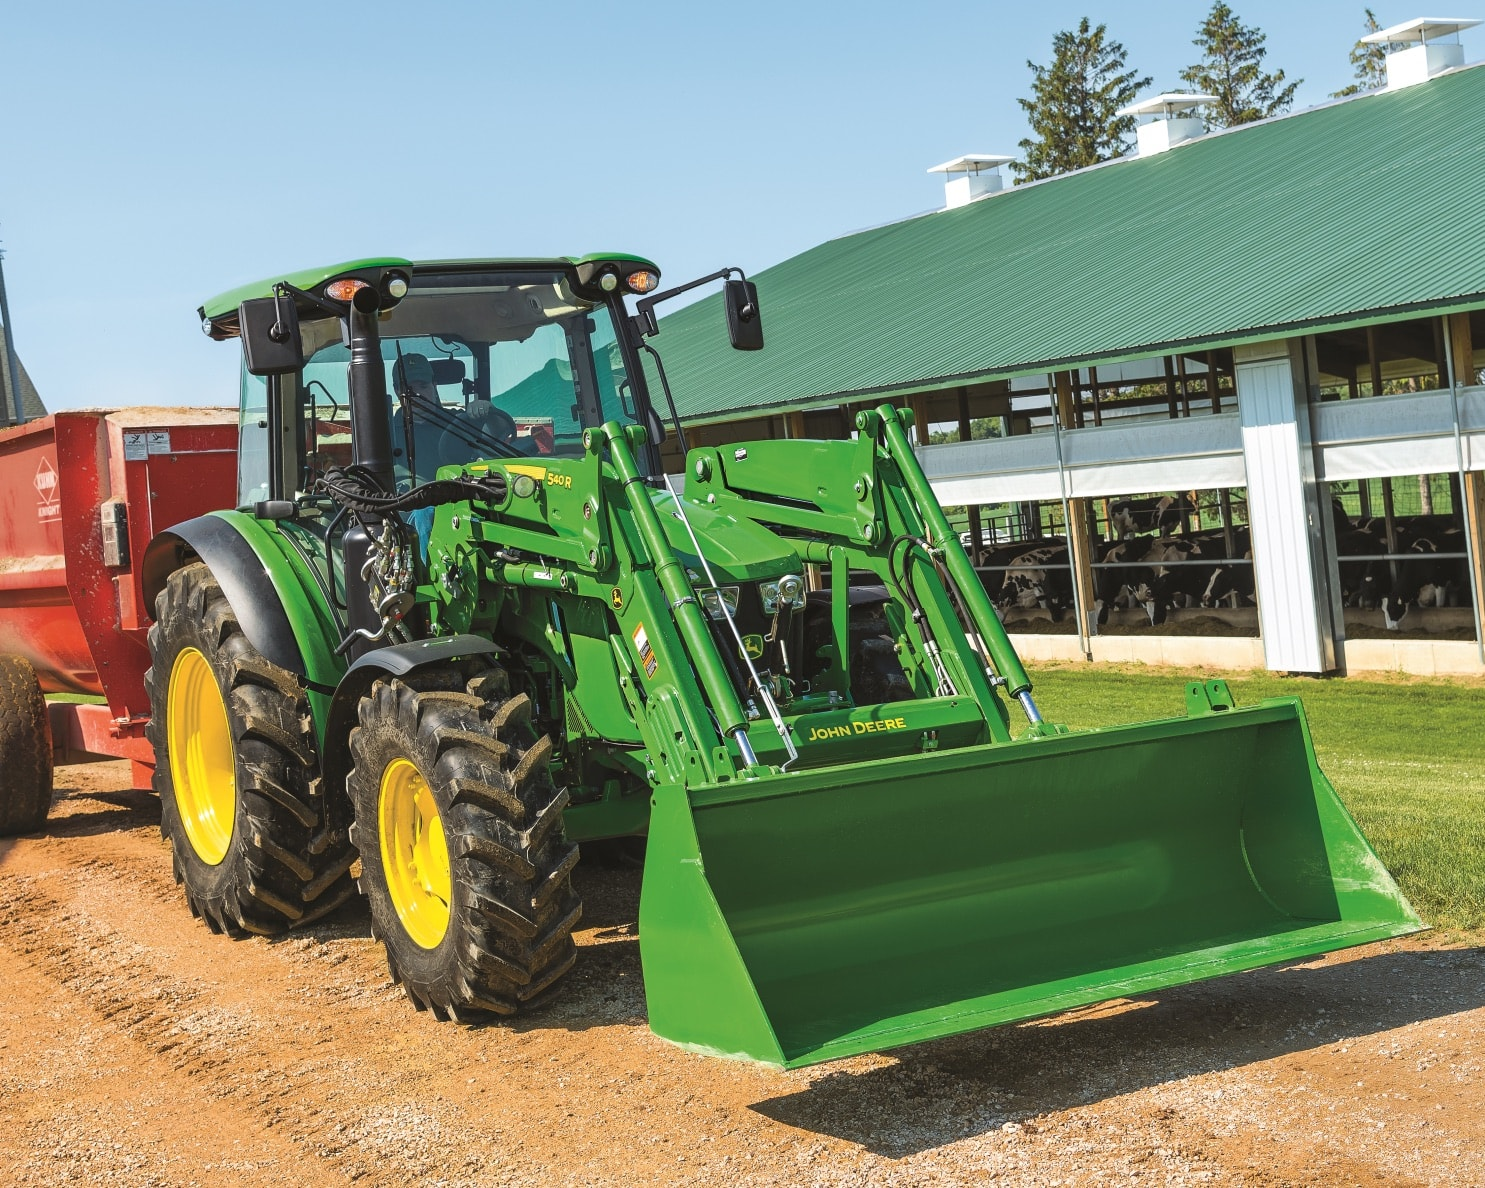 5R Series Utility Tractors